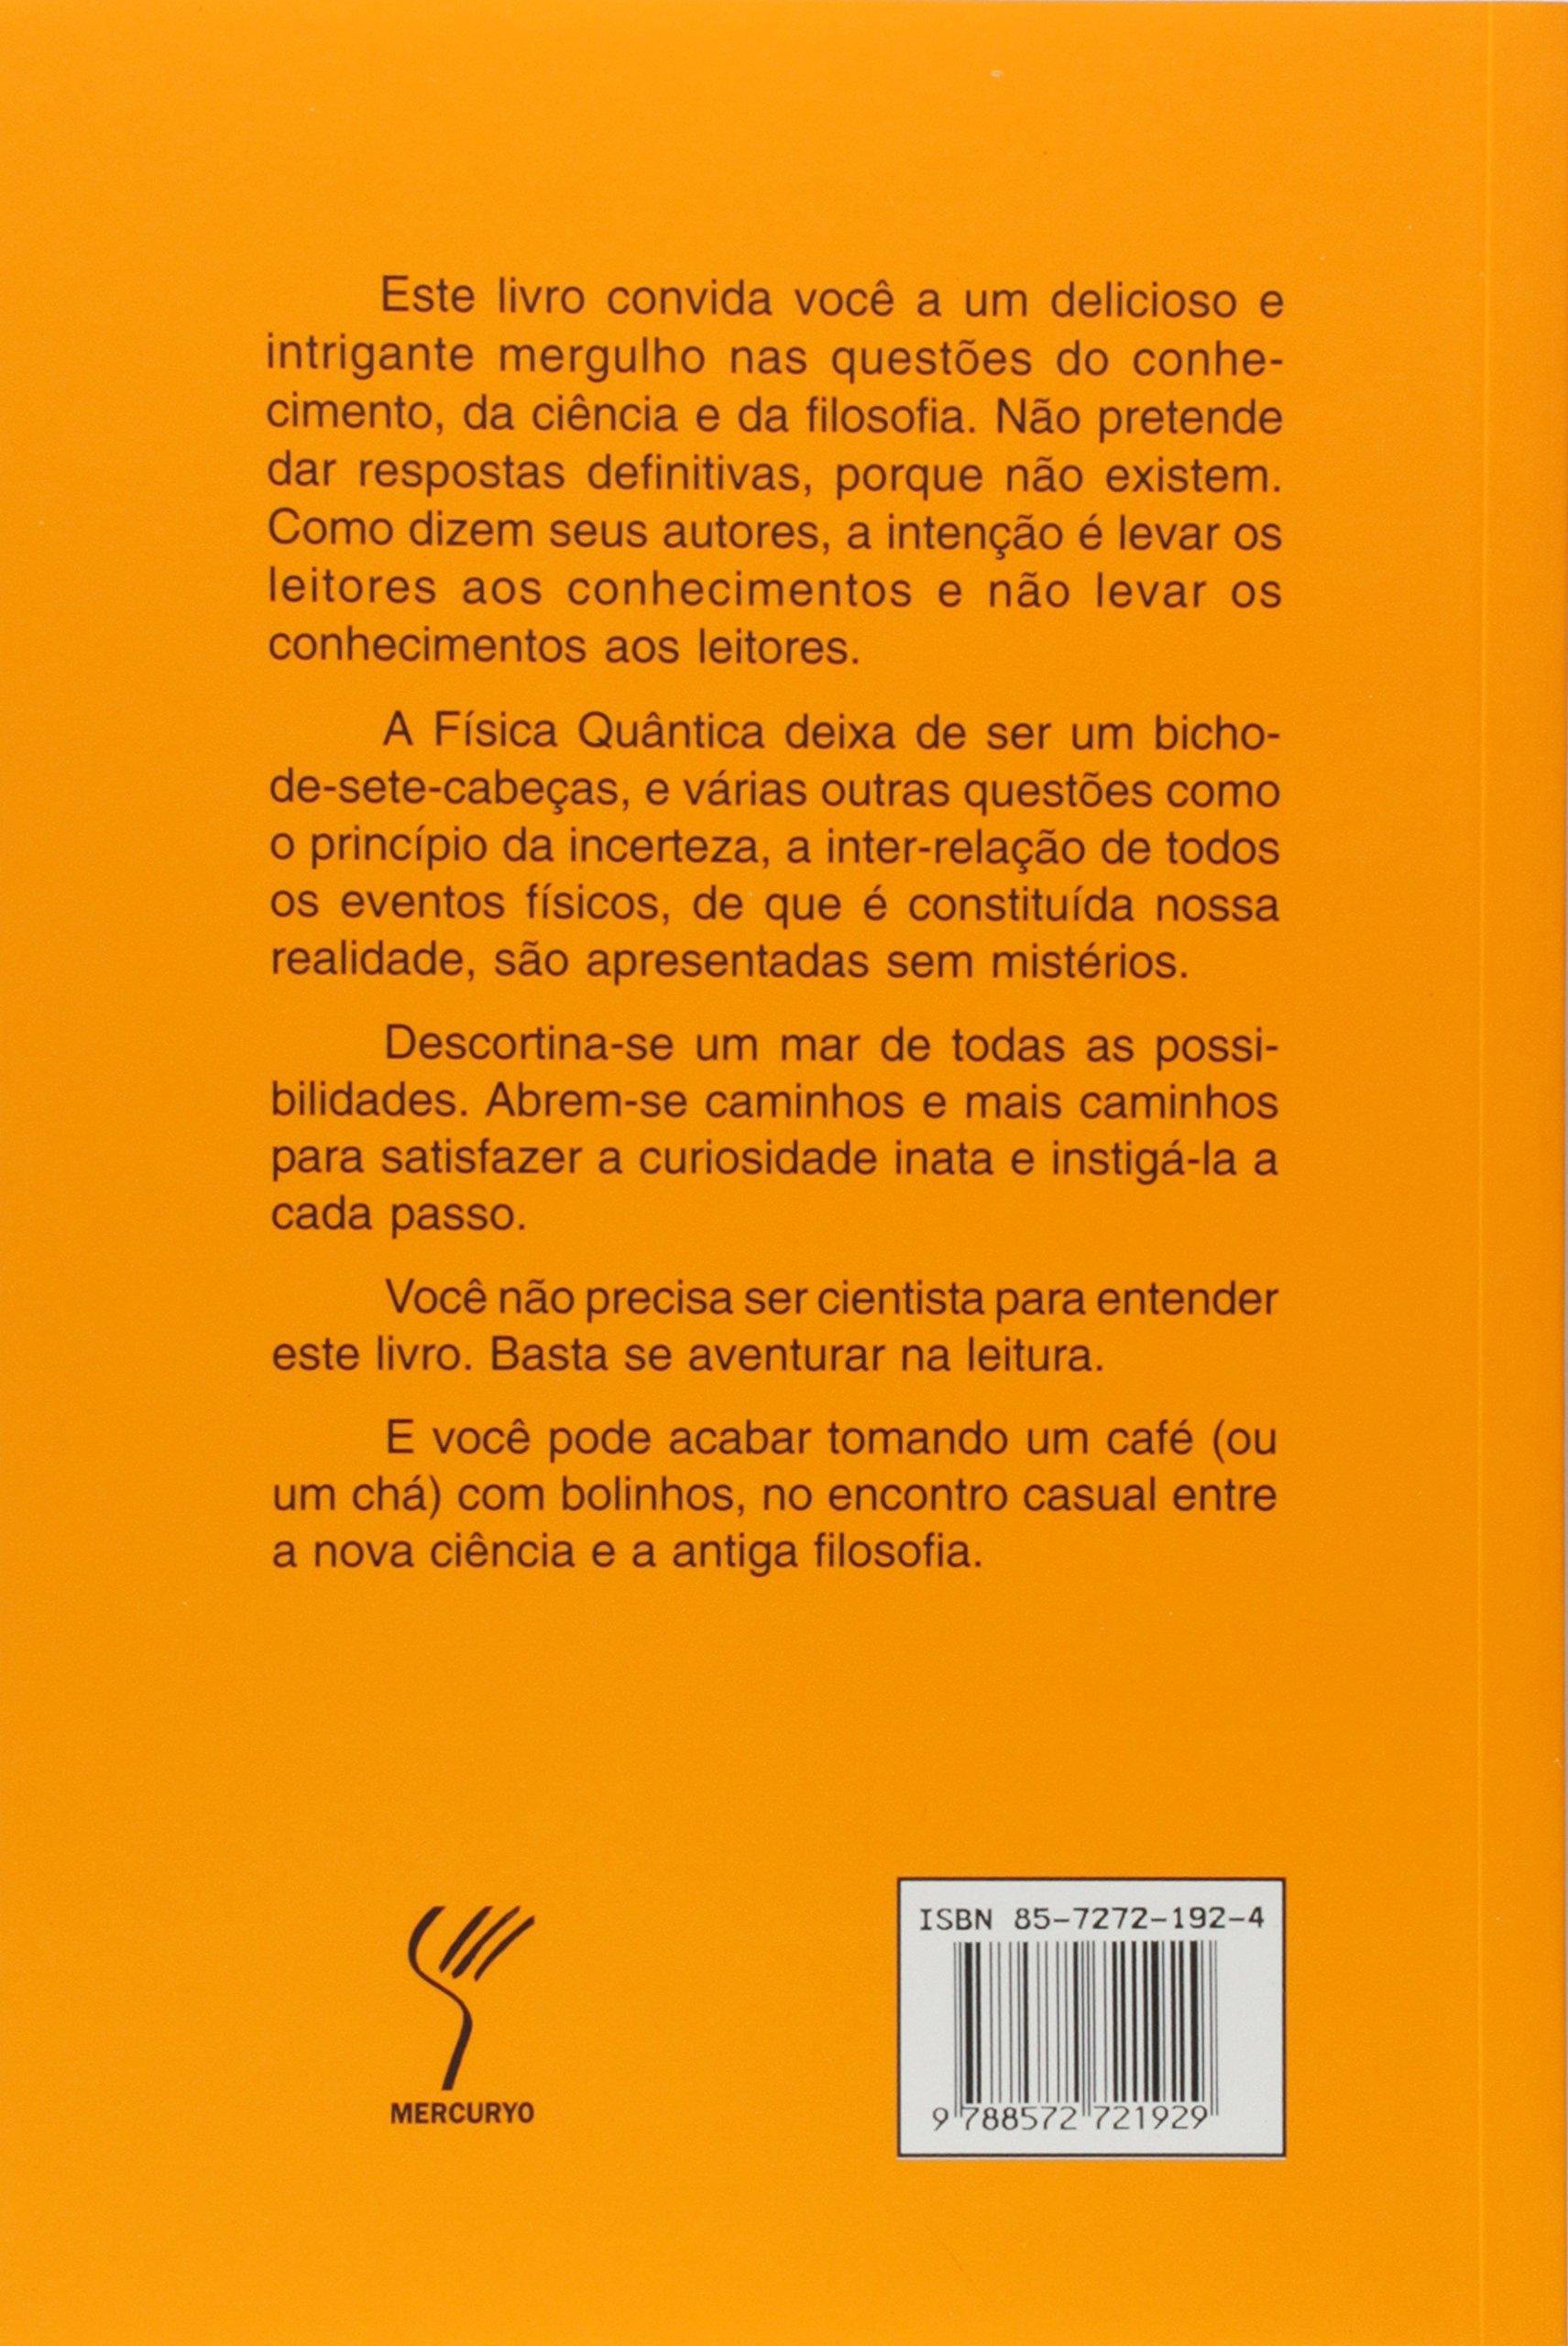 aac68fc8f A Realidade Quântica e a Filosofia - 9788572721929 - Livros na Amazon Brasil